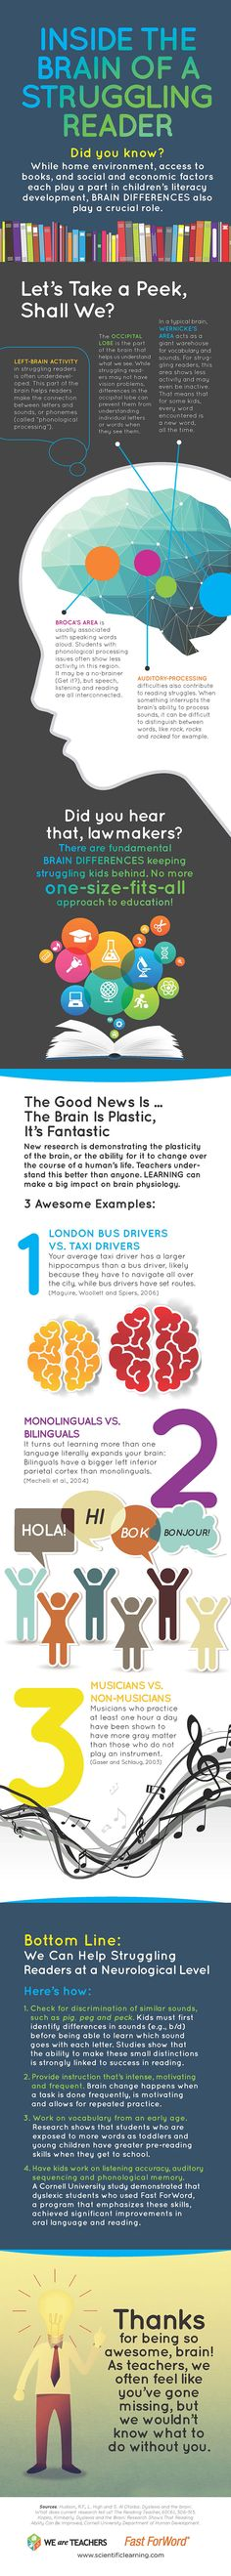 #Infographic: Inside the Brain of a Struggling Reader #WeAreTeachers